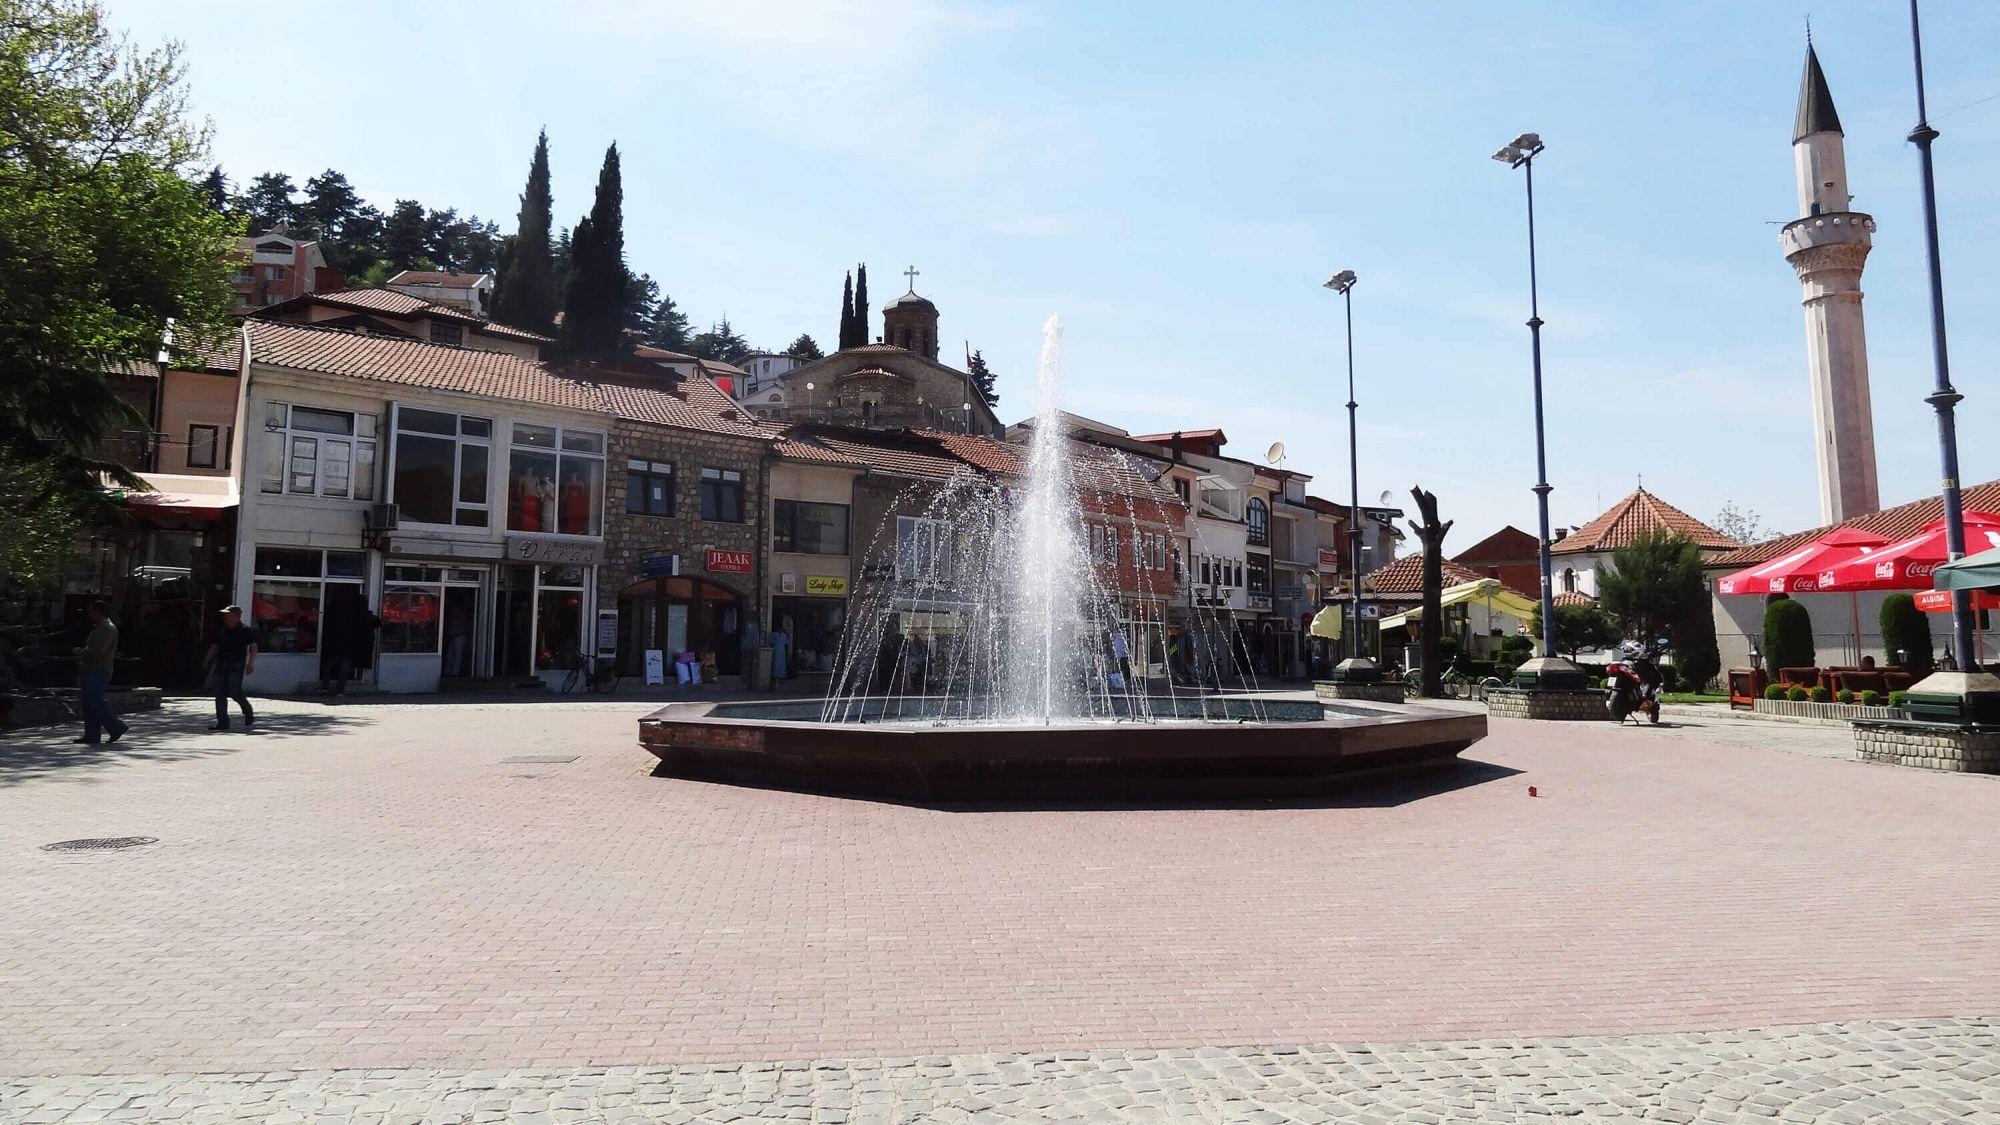 Ohri Gezi Rehberi Makedonya | Ohri Gezi Rehberi Makedonya Ohri